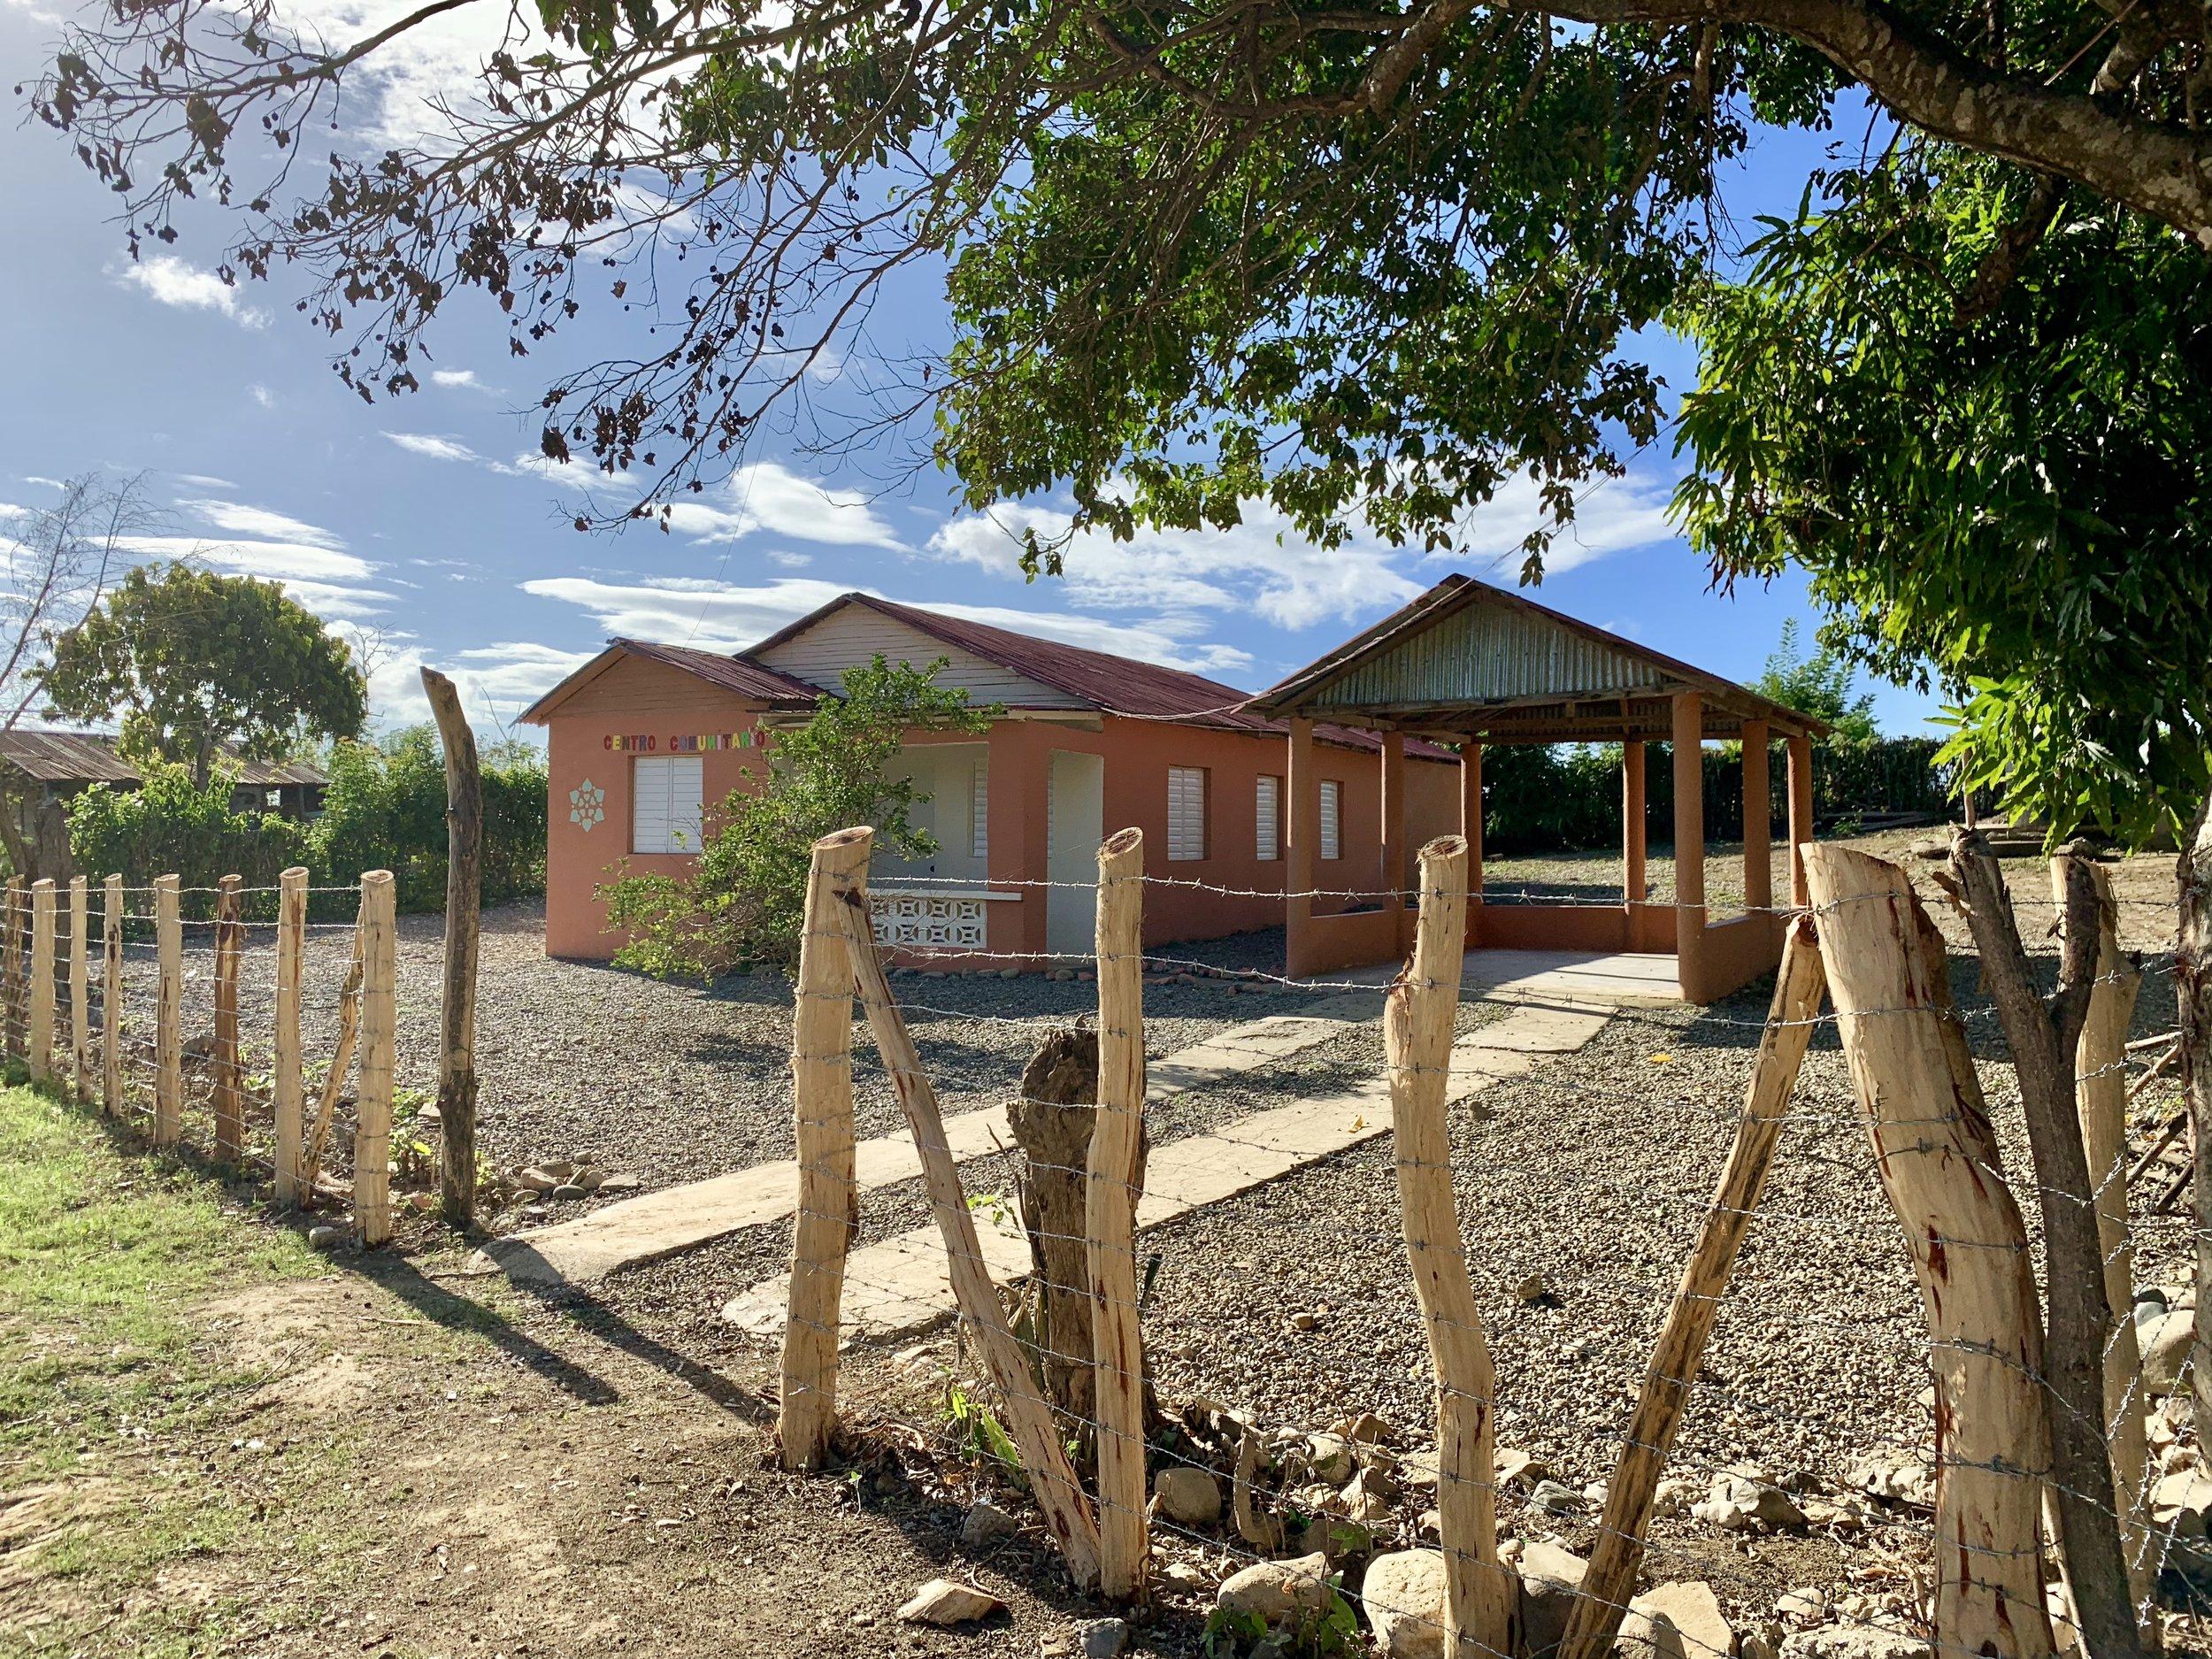 Community Center -